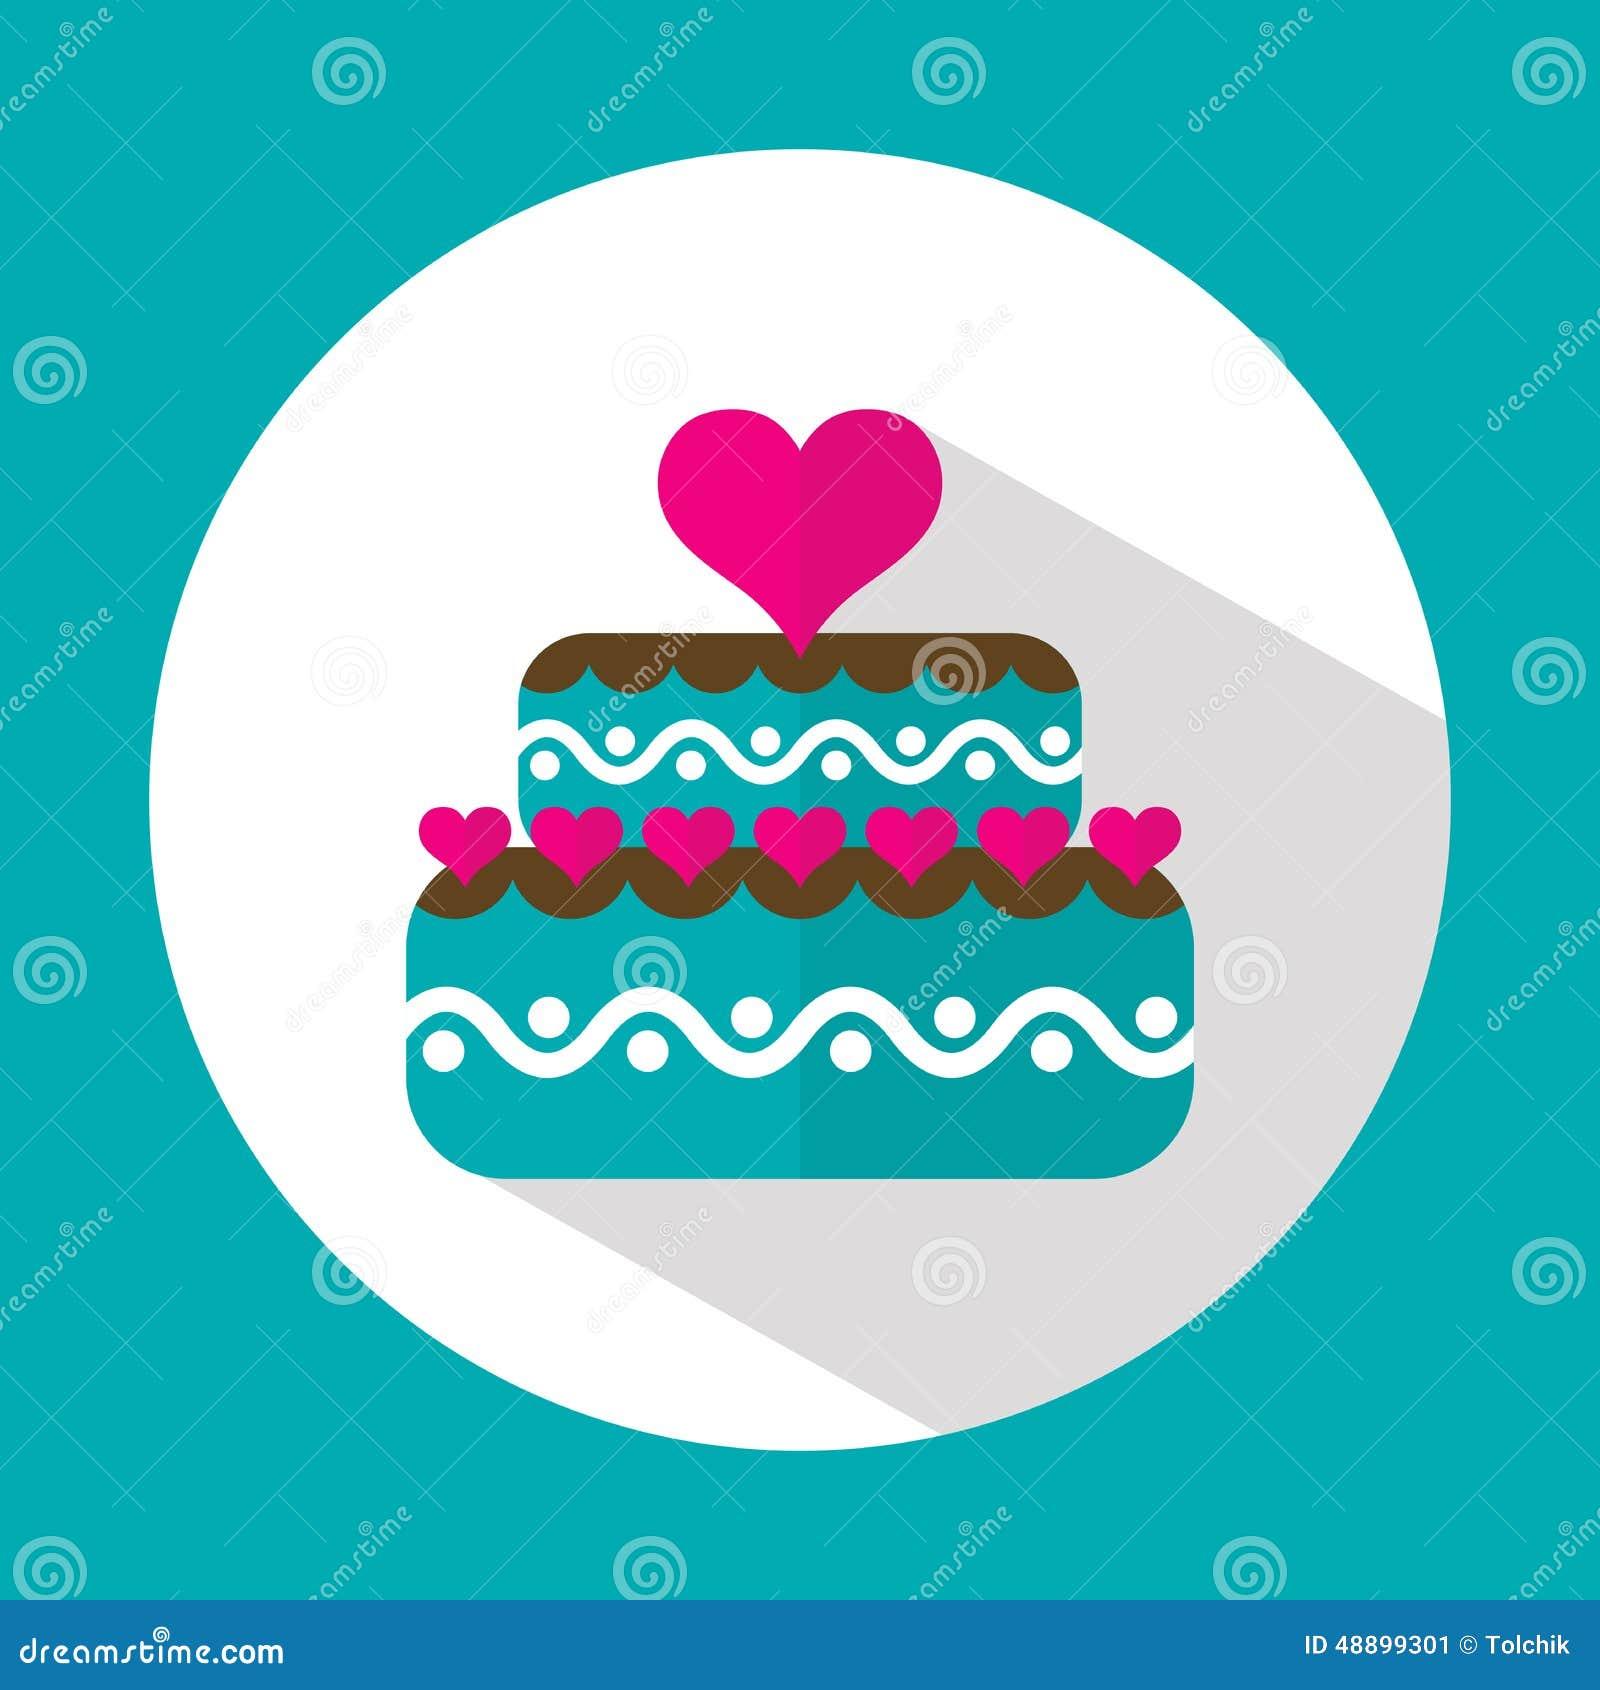 Birthday Cake Vector Flat Image Inspiration of Cake and Birthday